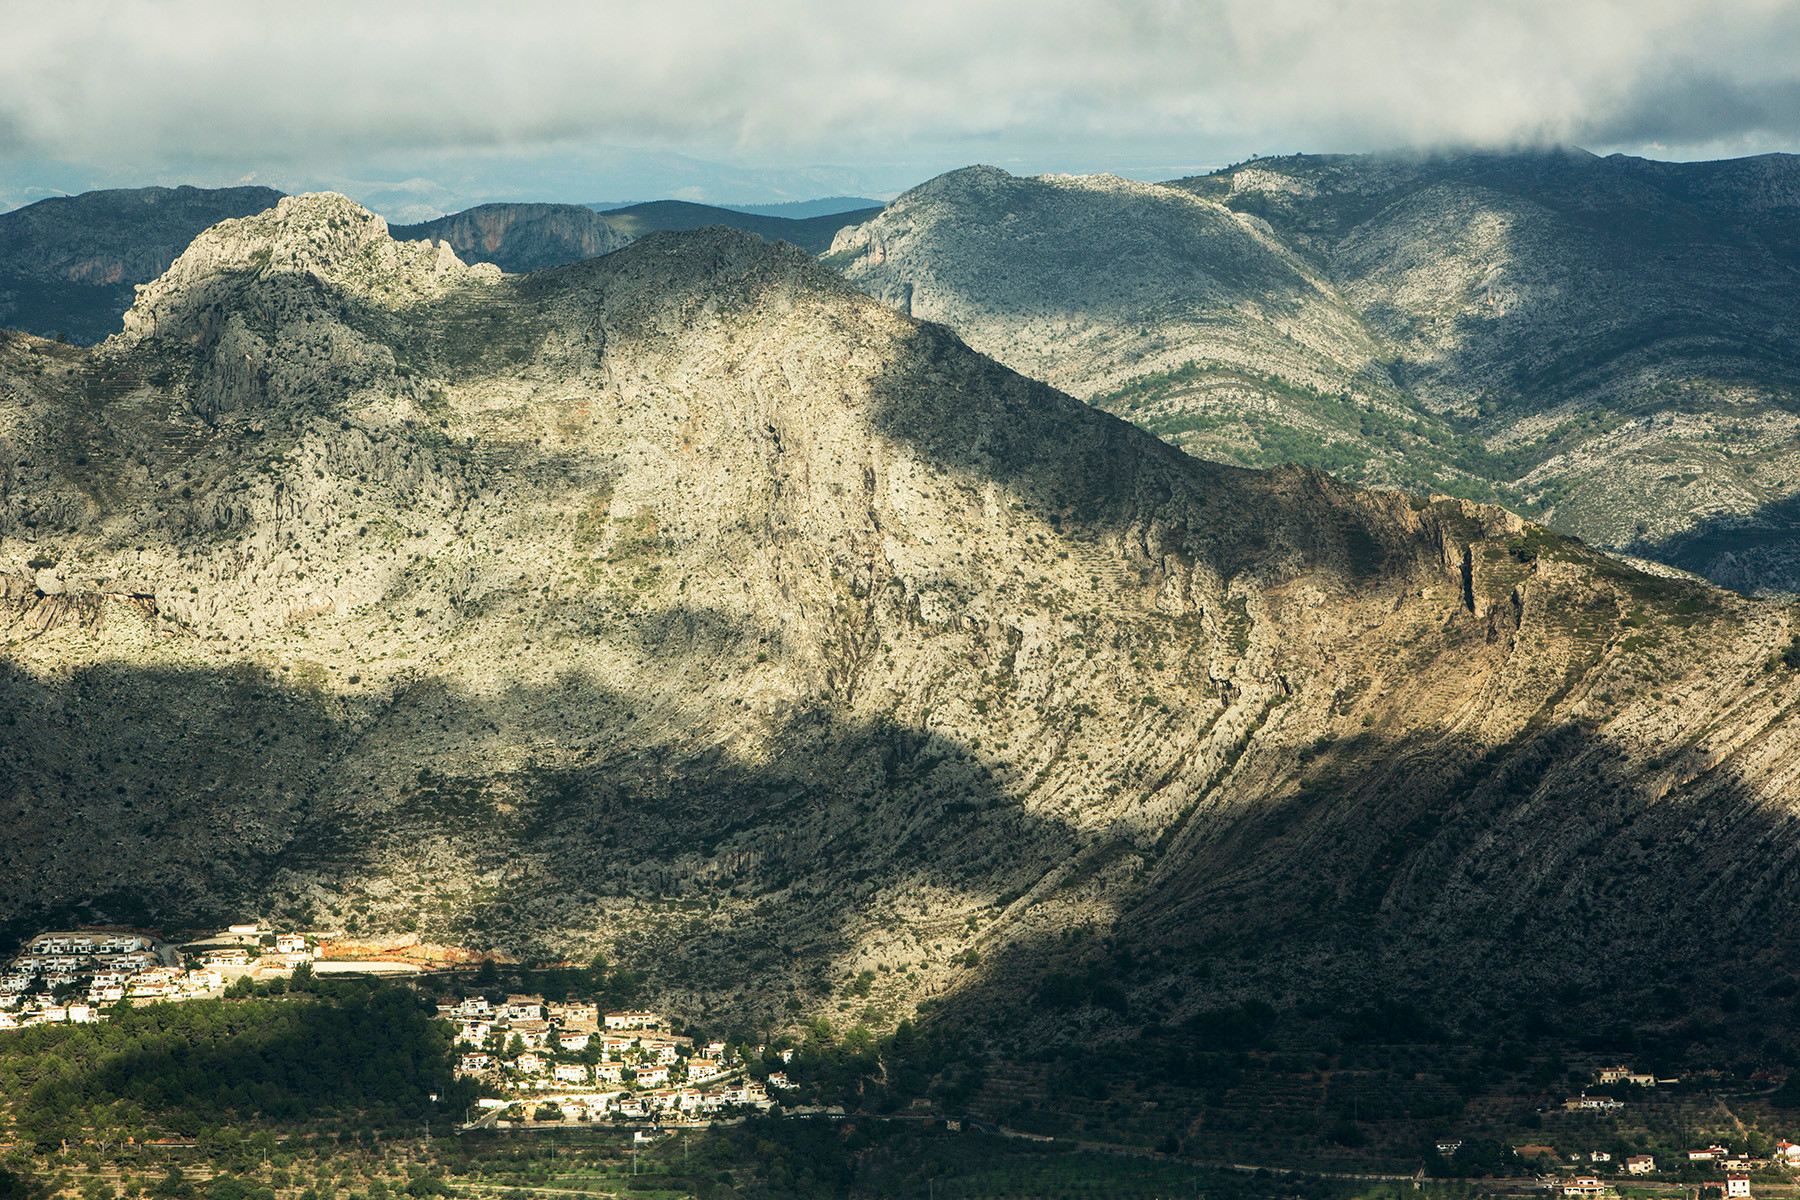 Sierra de Bernia, Tarbena, Alicante, Spain